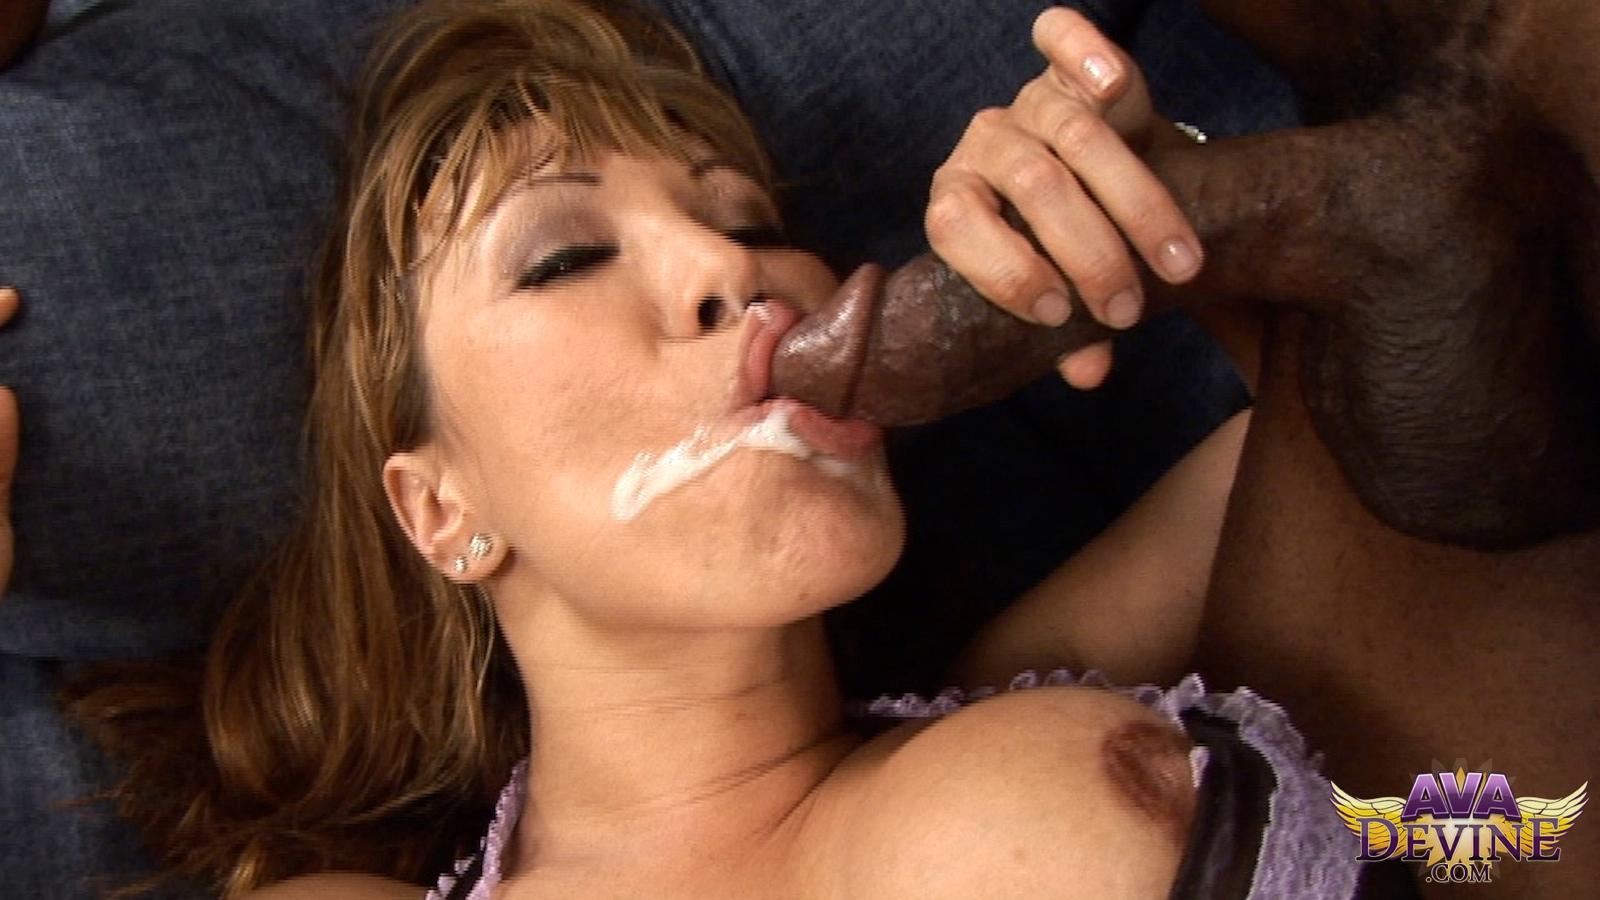 Ava Devine Cumshot eva devine cumshot | tubezzz porn photos